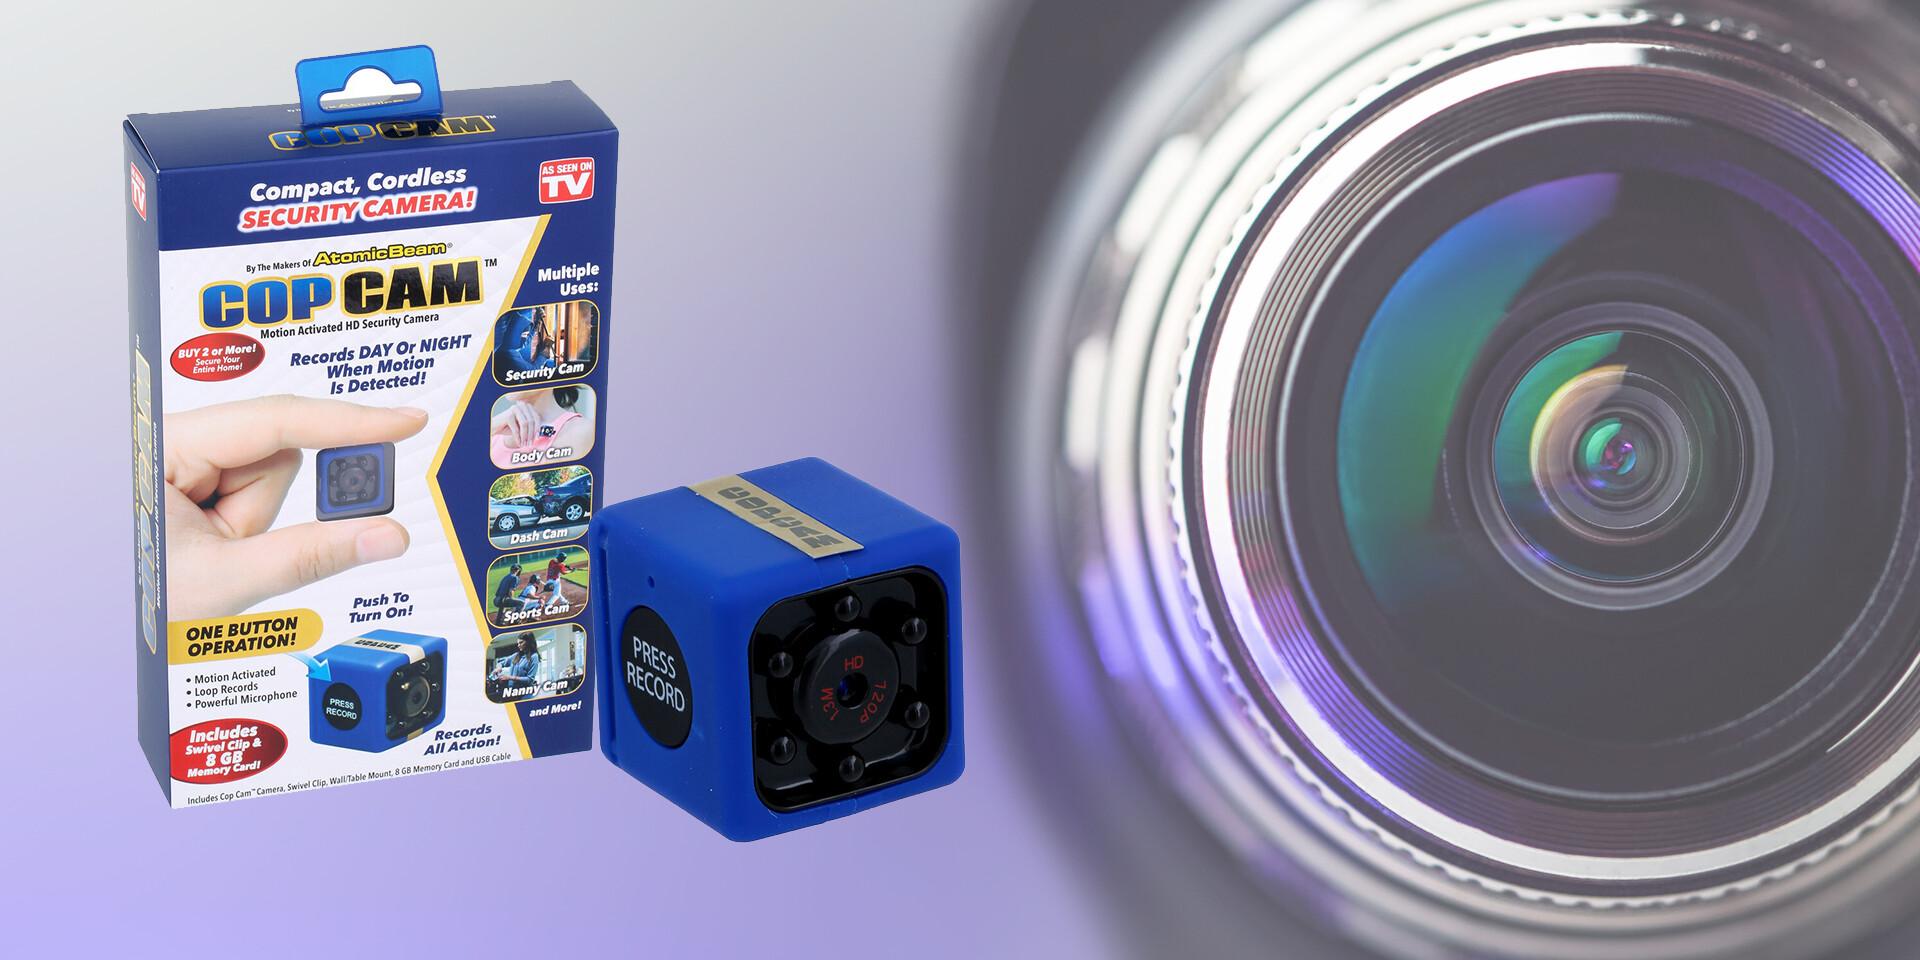 Mini kamera s rozlíšením Full HD